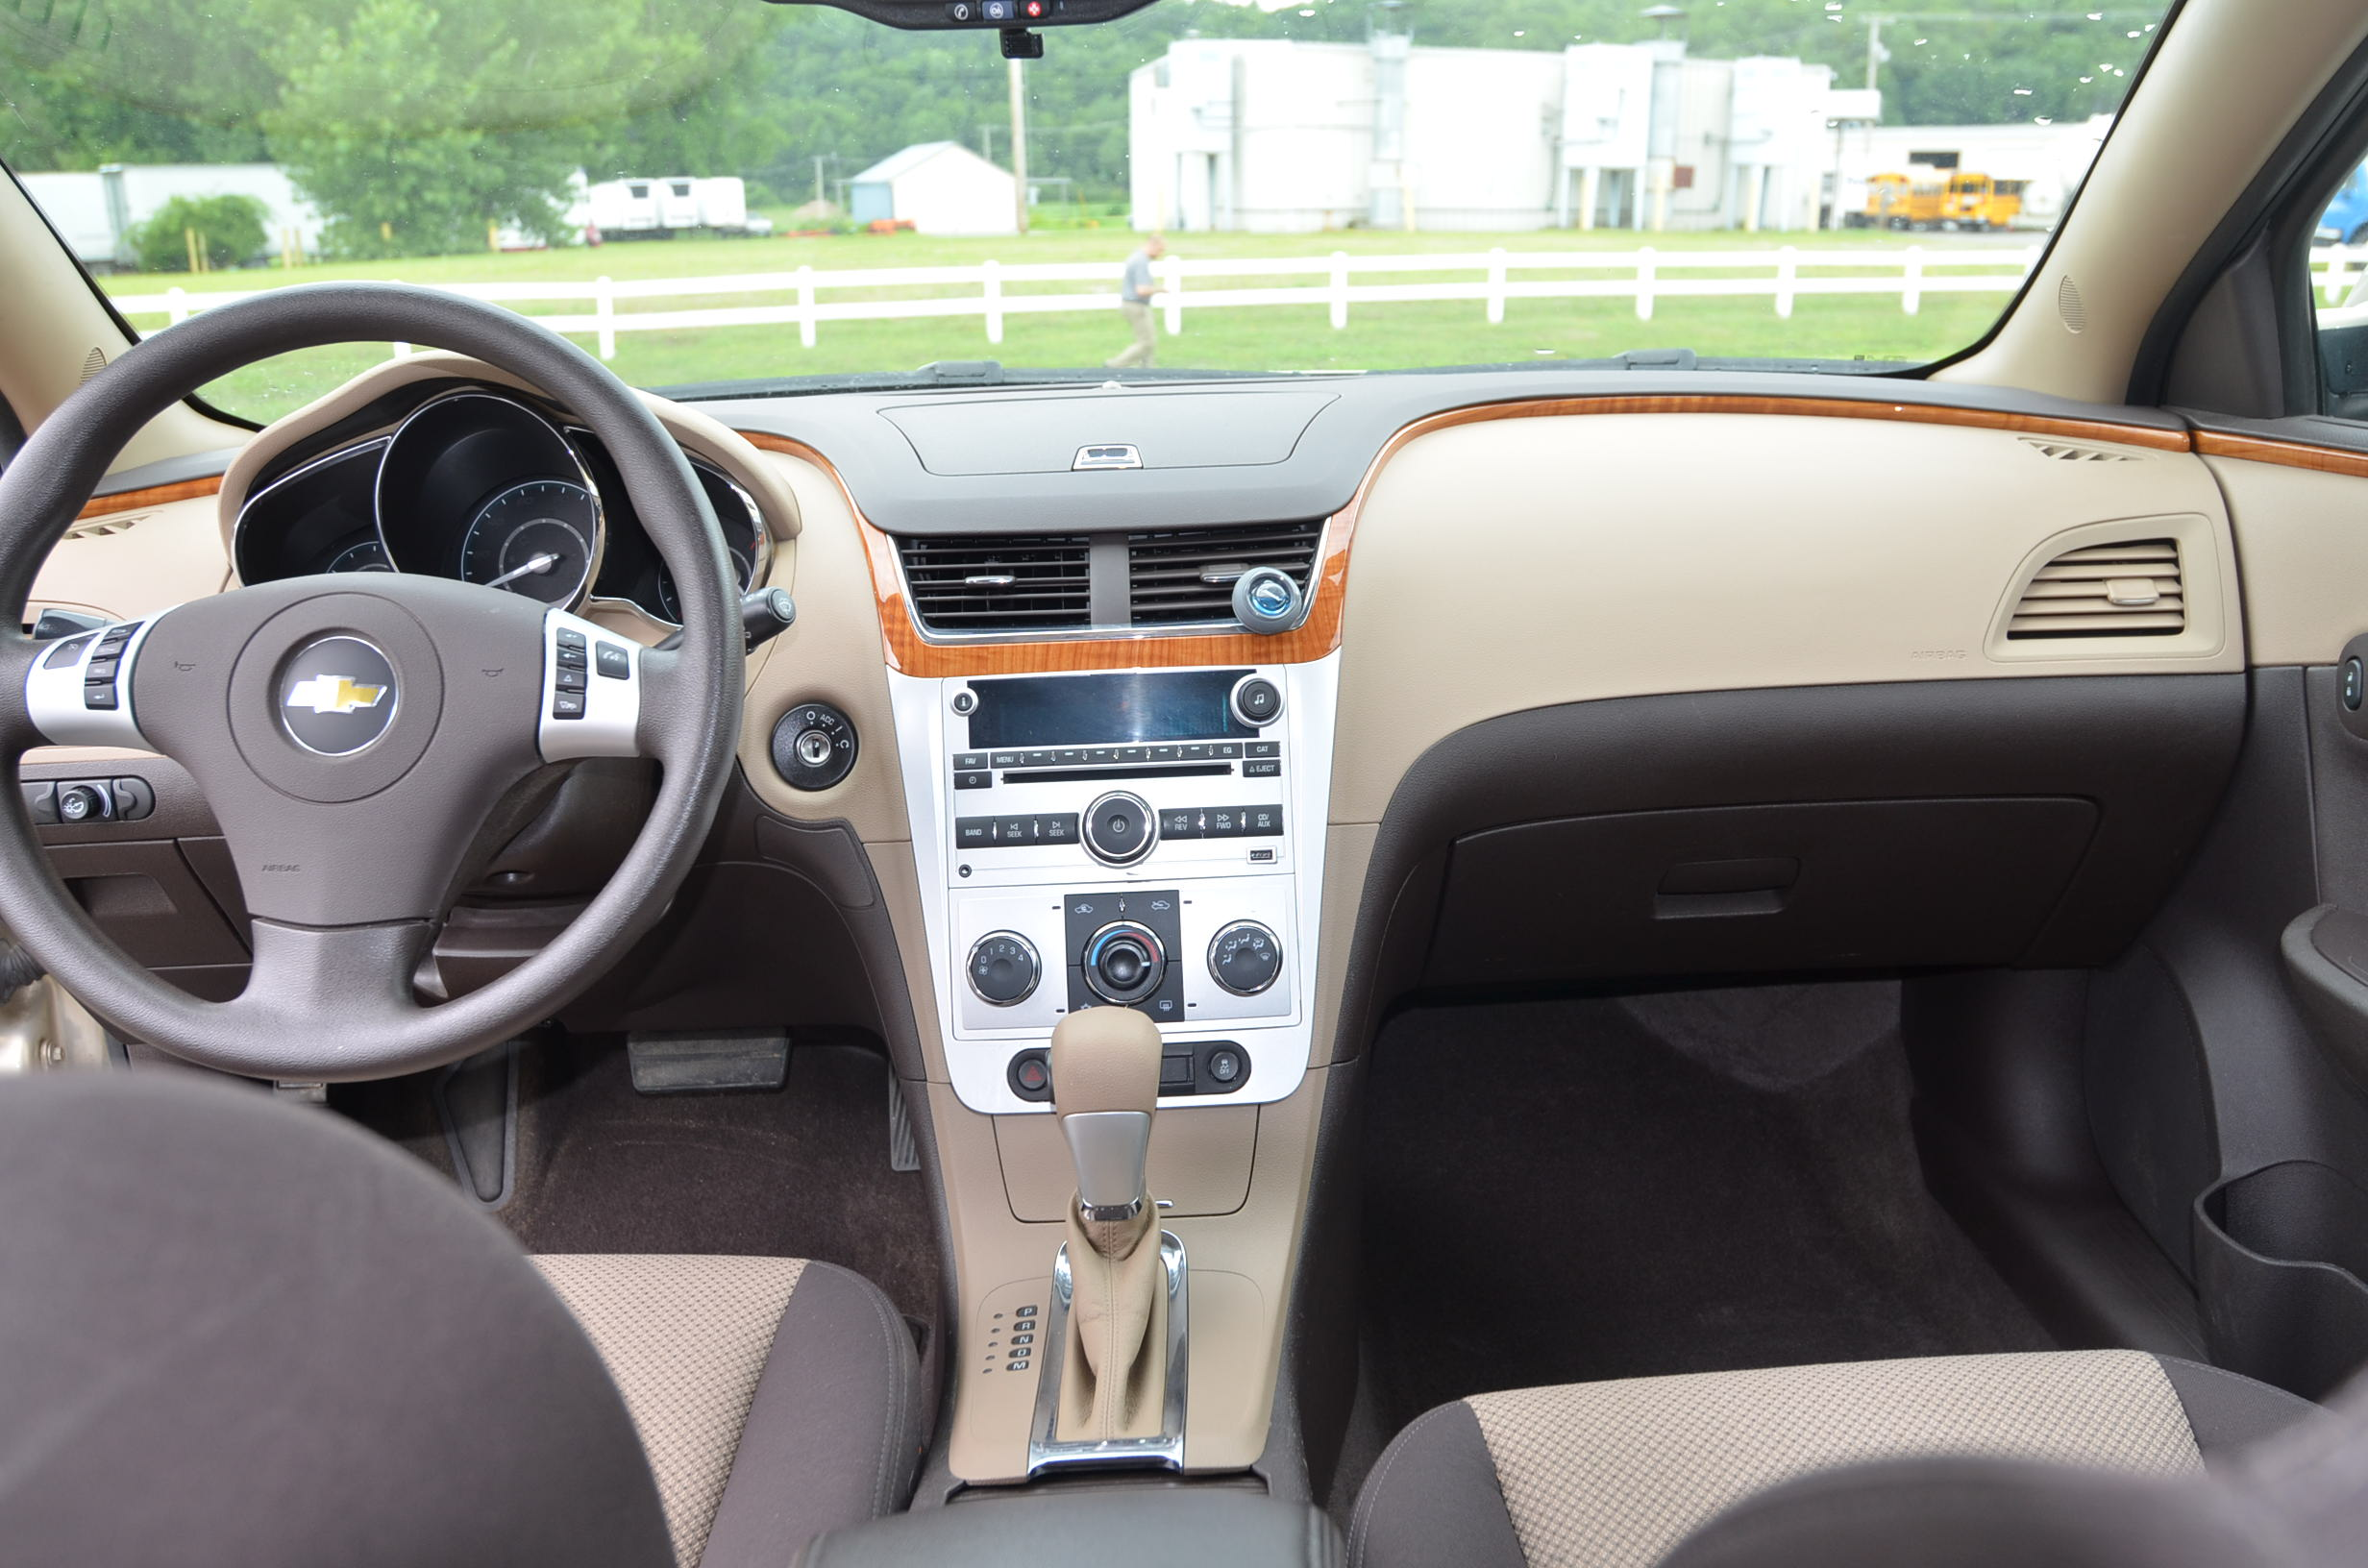 Superb 2012 Chevrolet Malibu LT Sedan 4